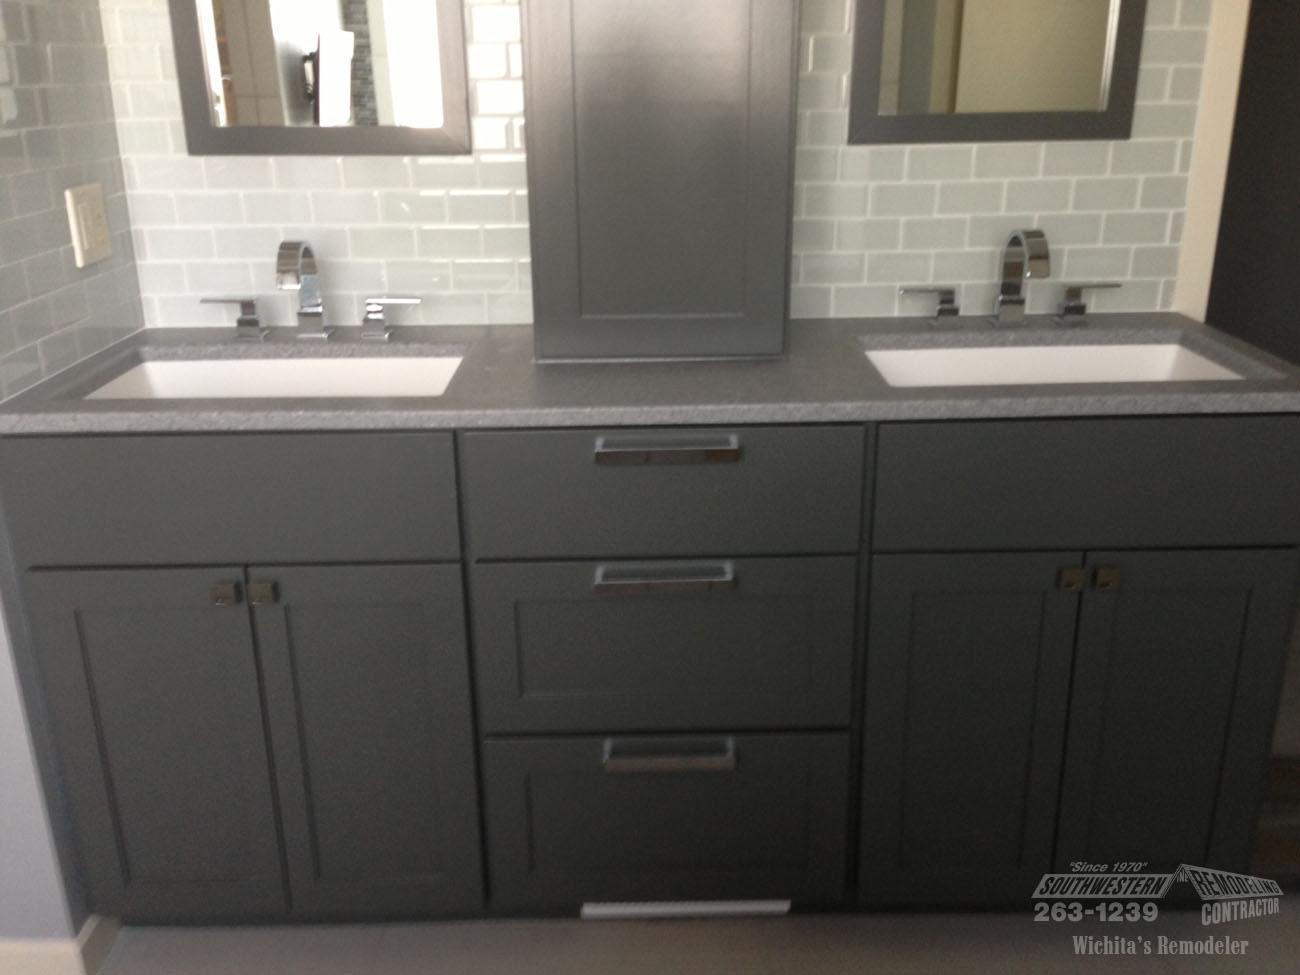 Bathroom Remodeling Southwestern Remodeling Wichita - 1970 bathroom remodel